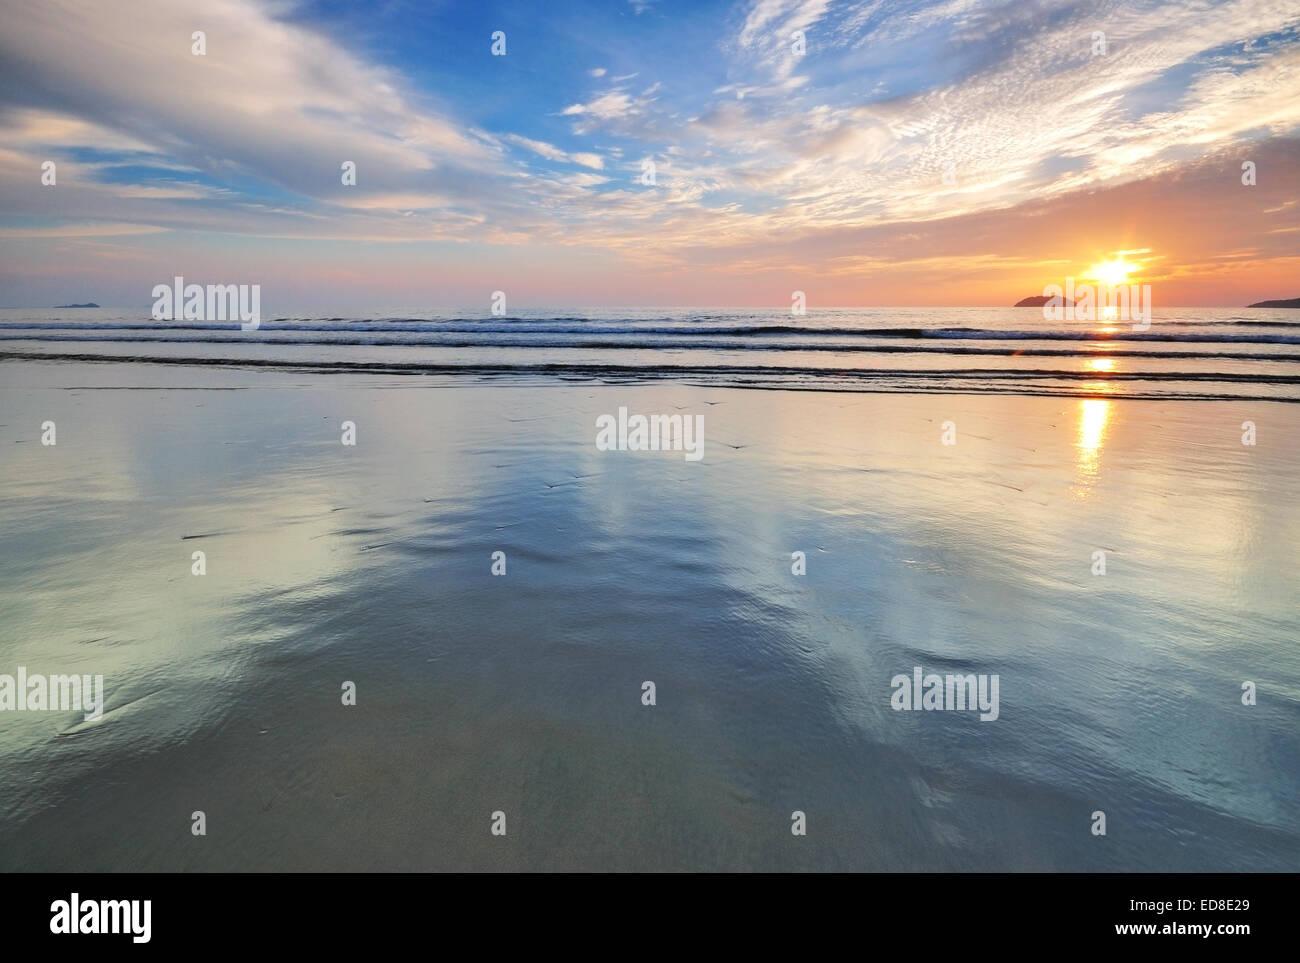 Sunset by the beach in Tanjung Aru Beach, Kota Kinabalu, Sabah Borneo, Malaysia. - Stock Image